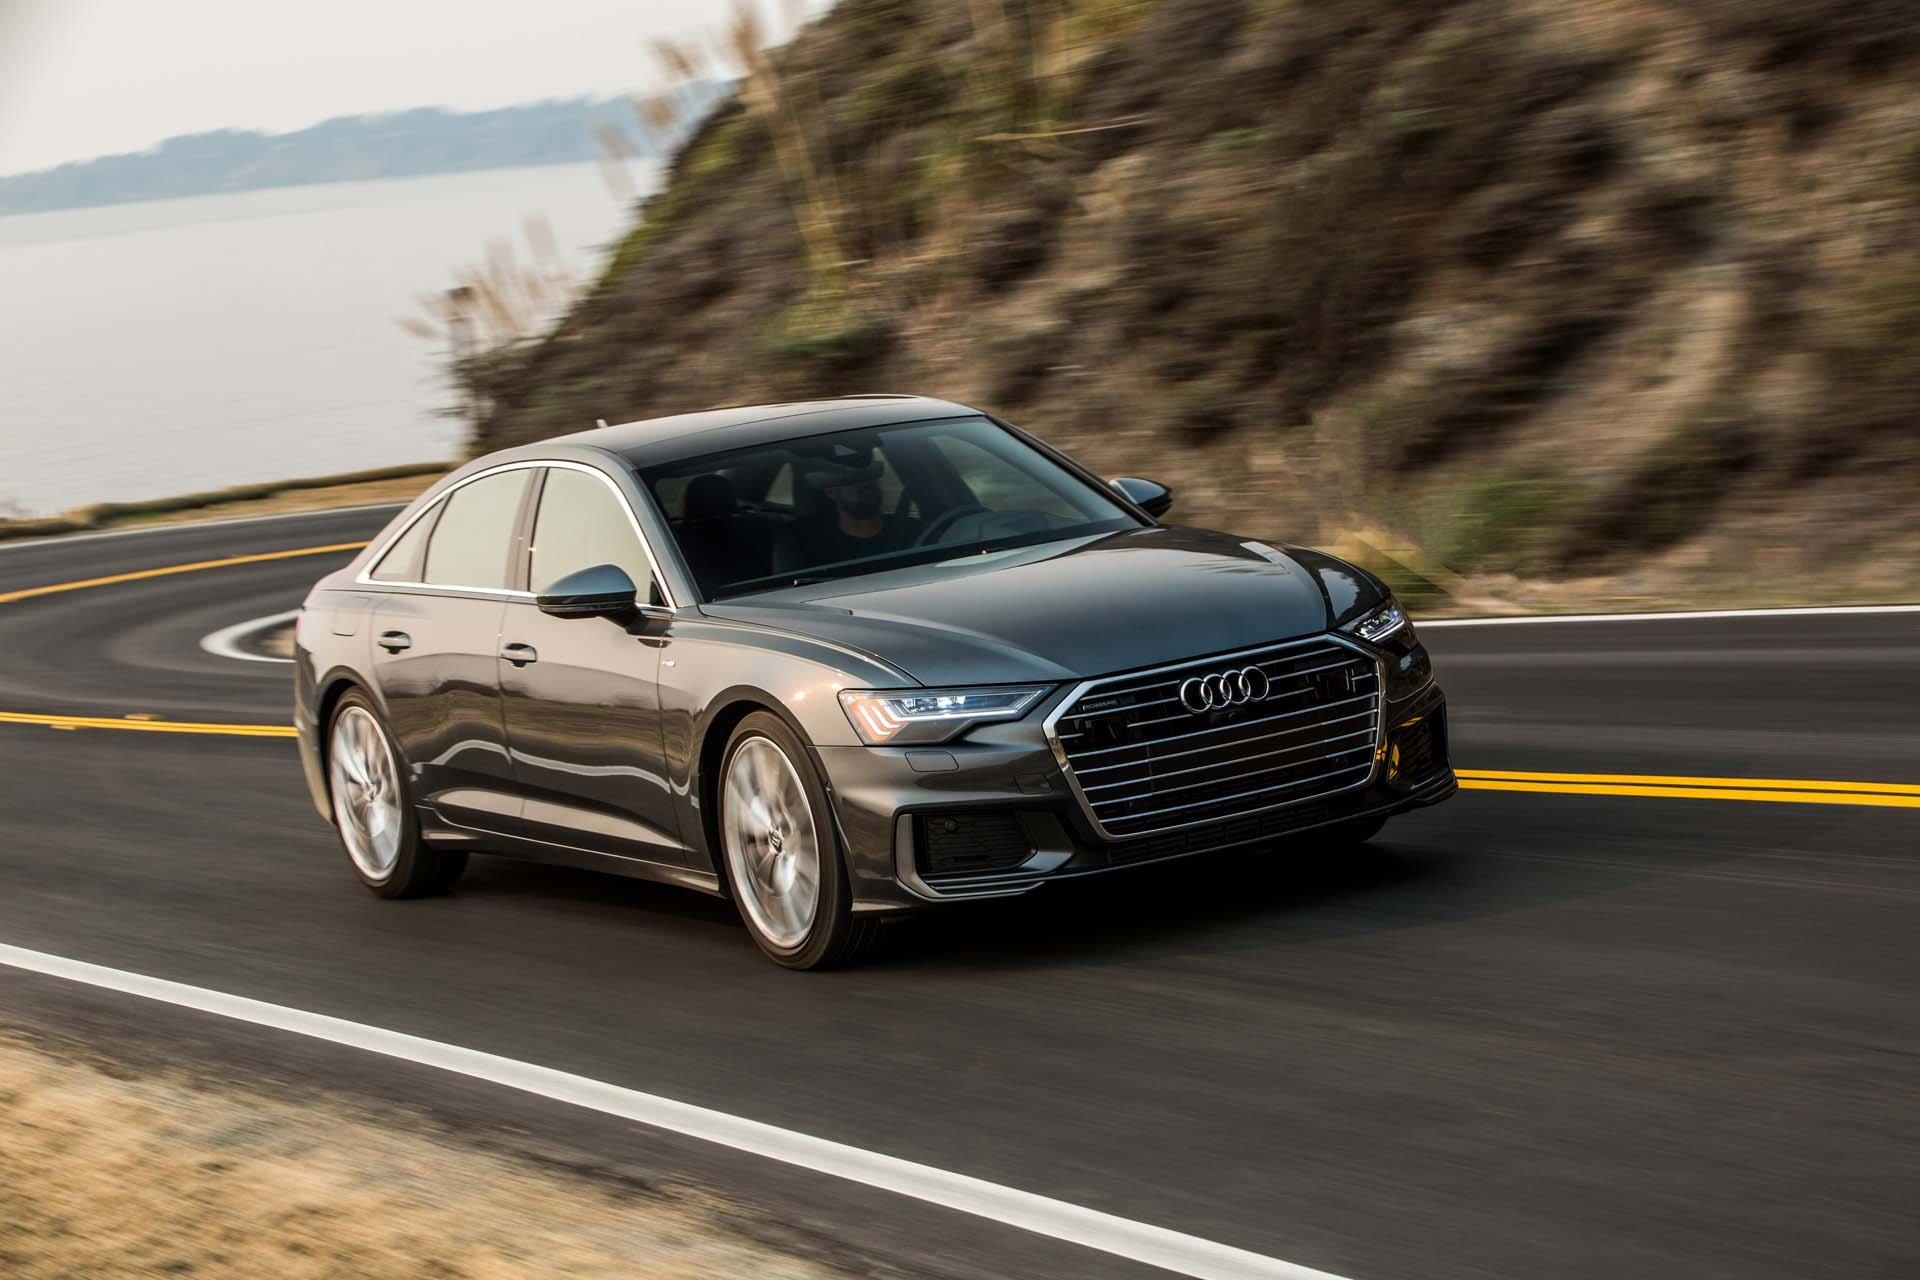 New 2020 Audi A6 2.0T quattro Premium 3.0T quattro Premium for sale $62,700 at M and V Leasing in Brooklyn NY 11223 1